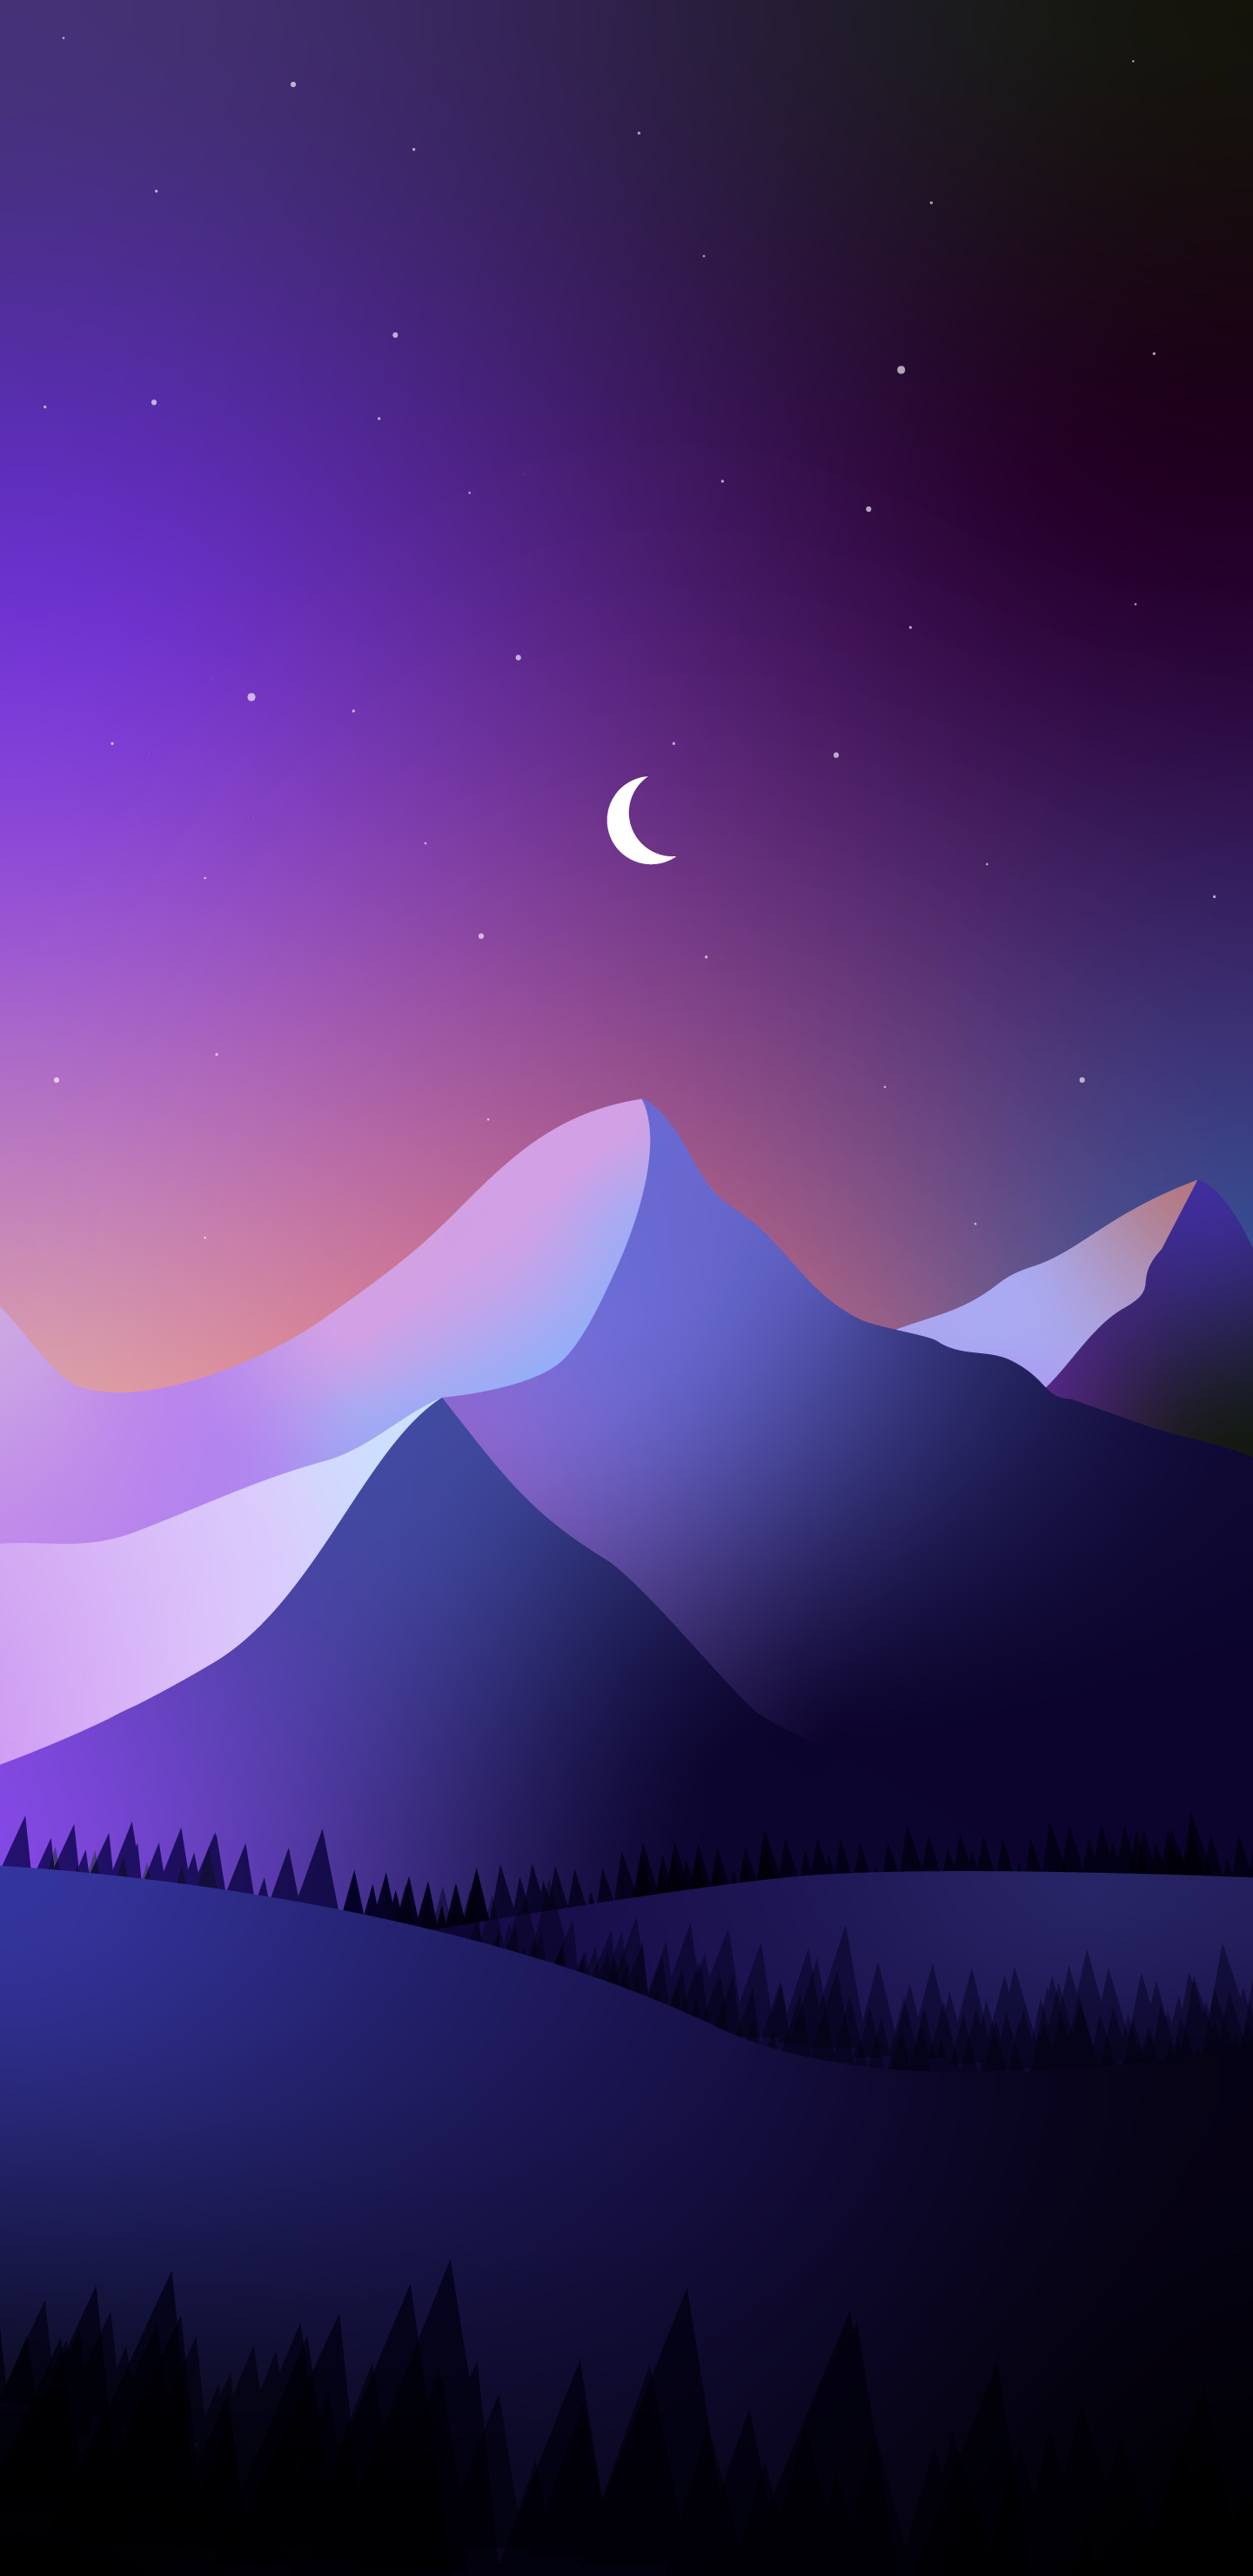 1st attempt at something on illustrator Wallpaper for phones 1440x2960